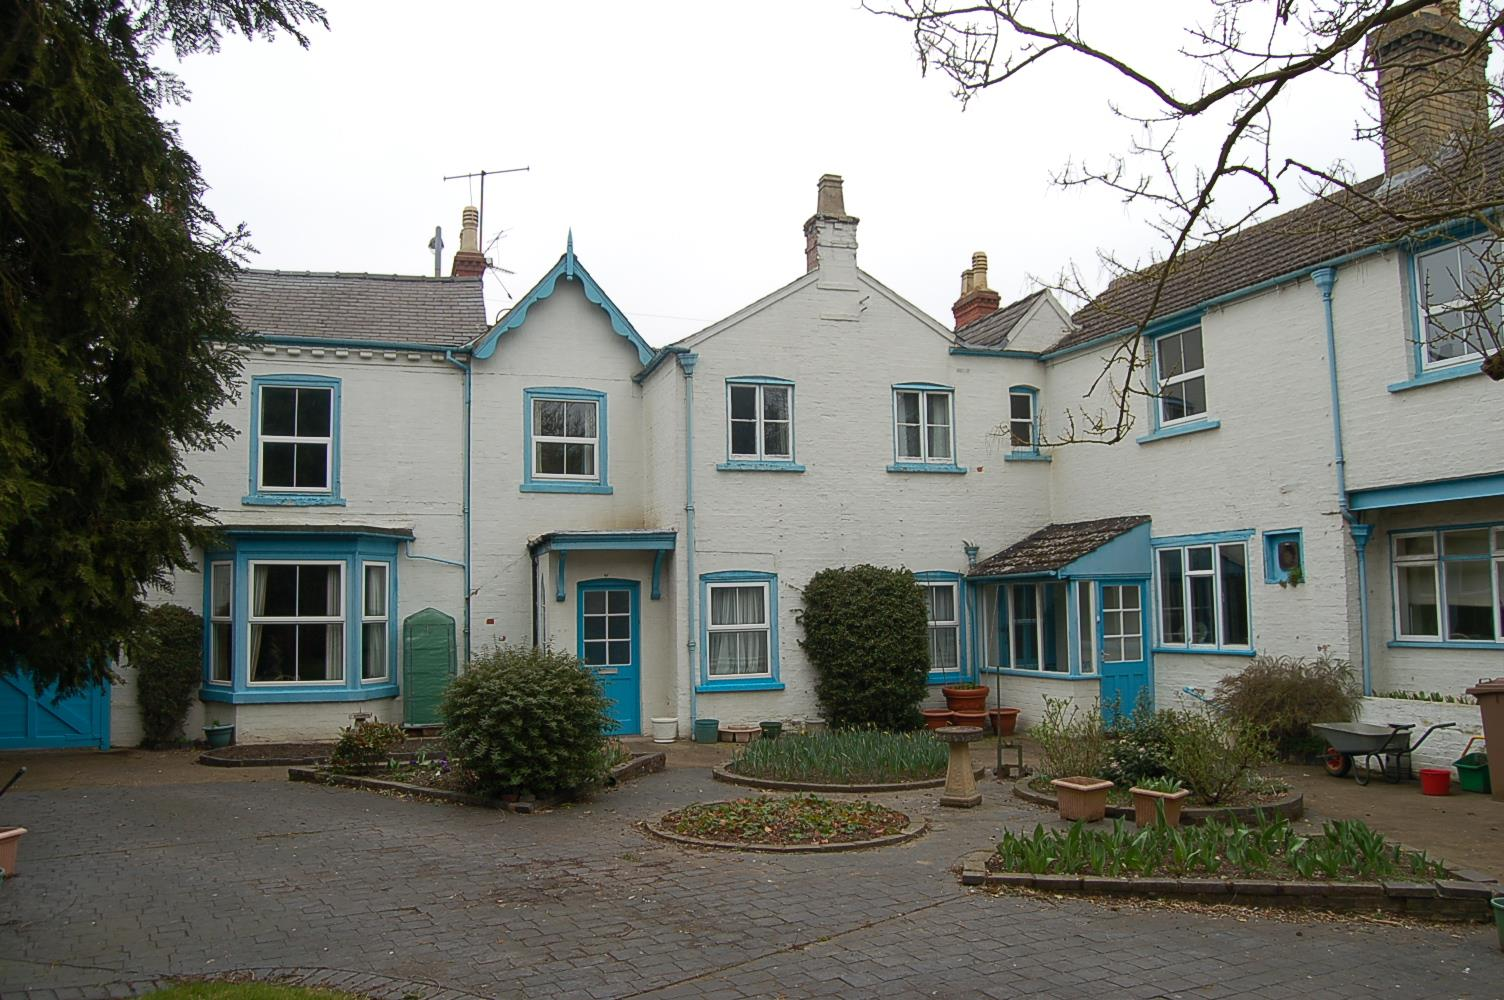 High Street, Heckington